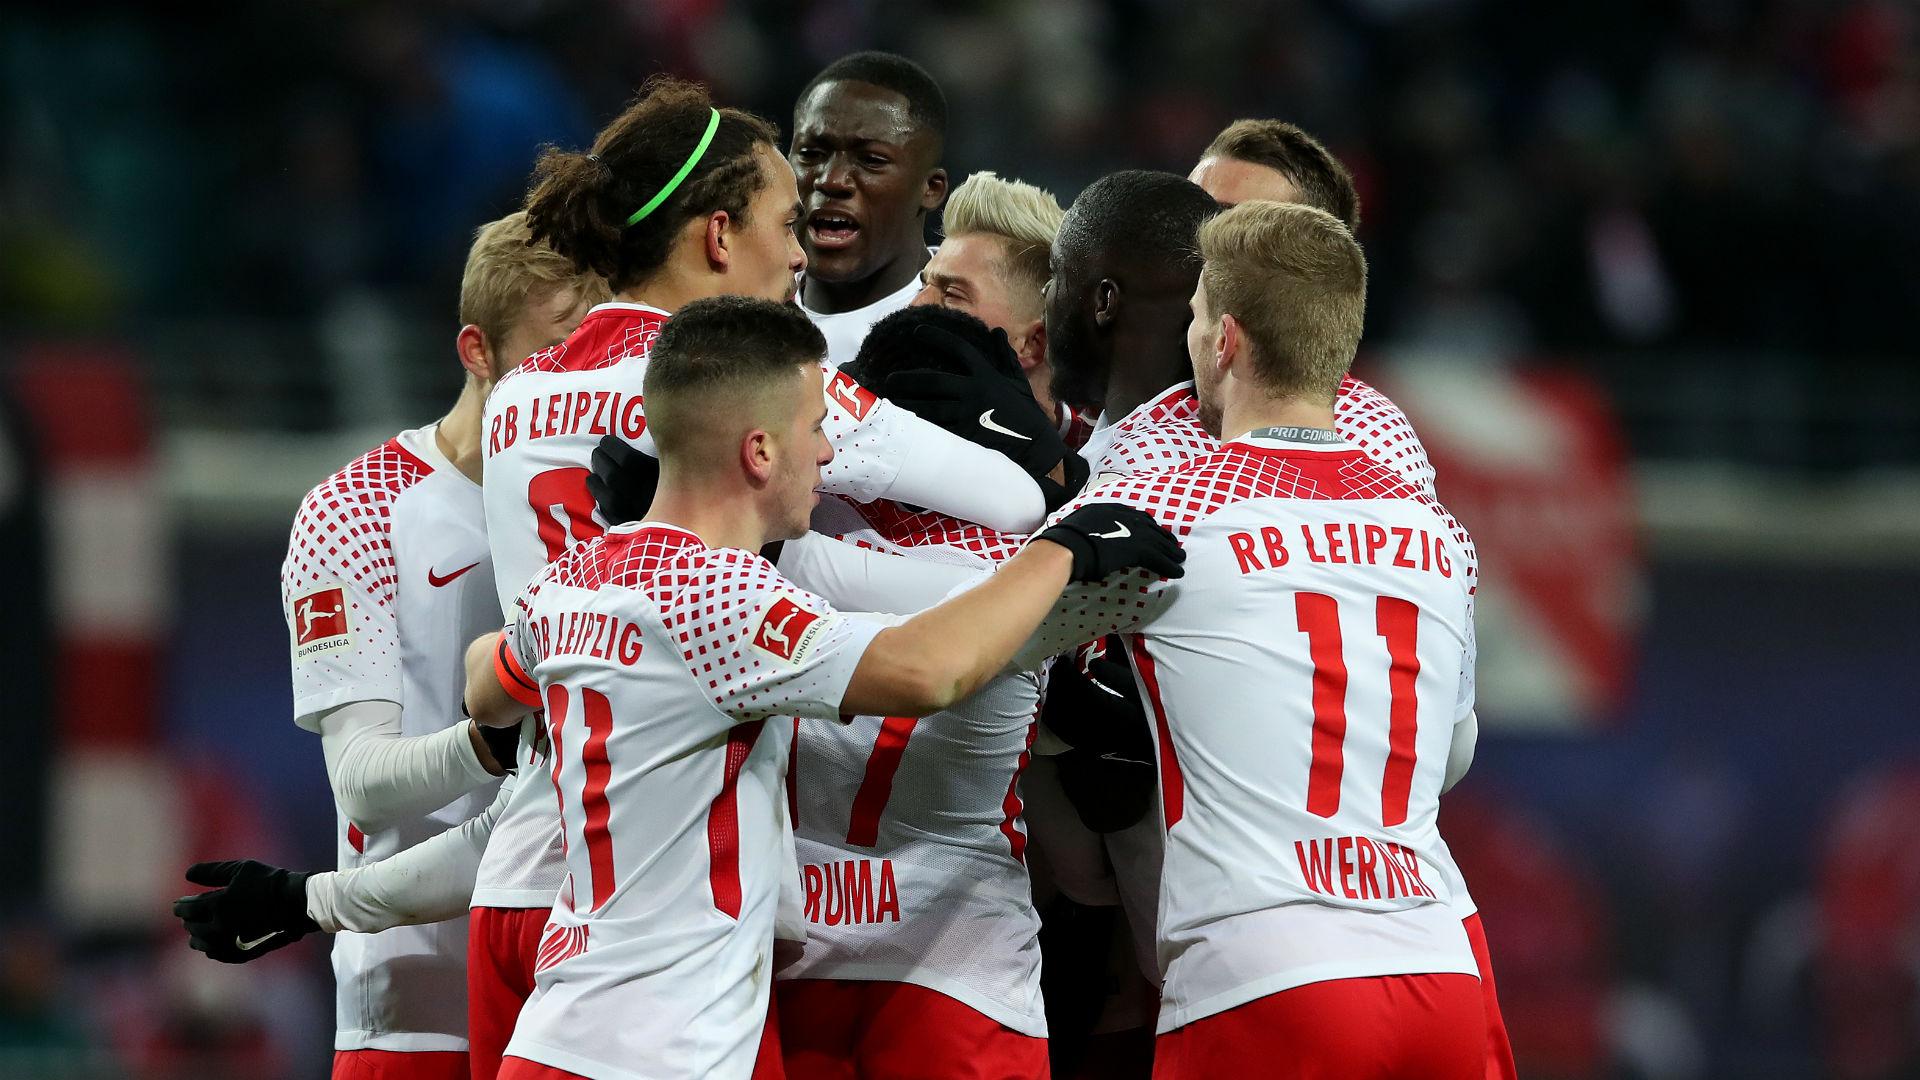 Rb Leipzig 2 Mannschaft